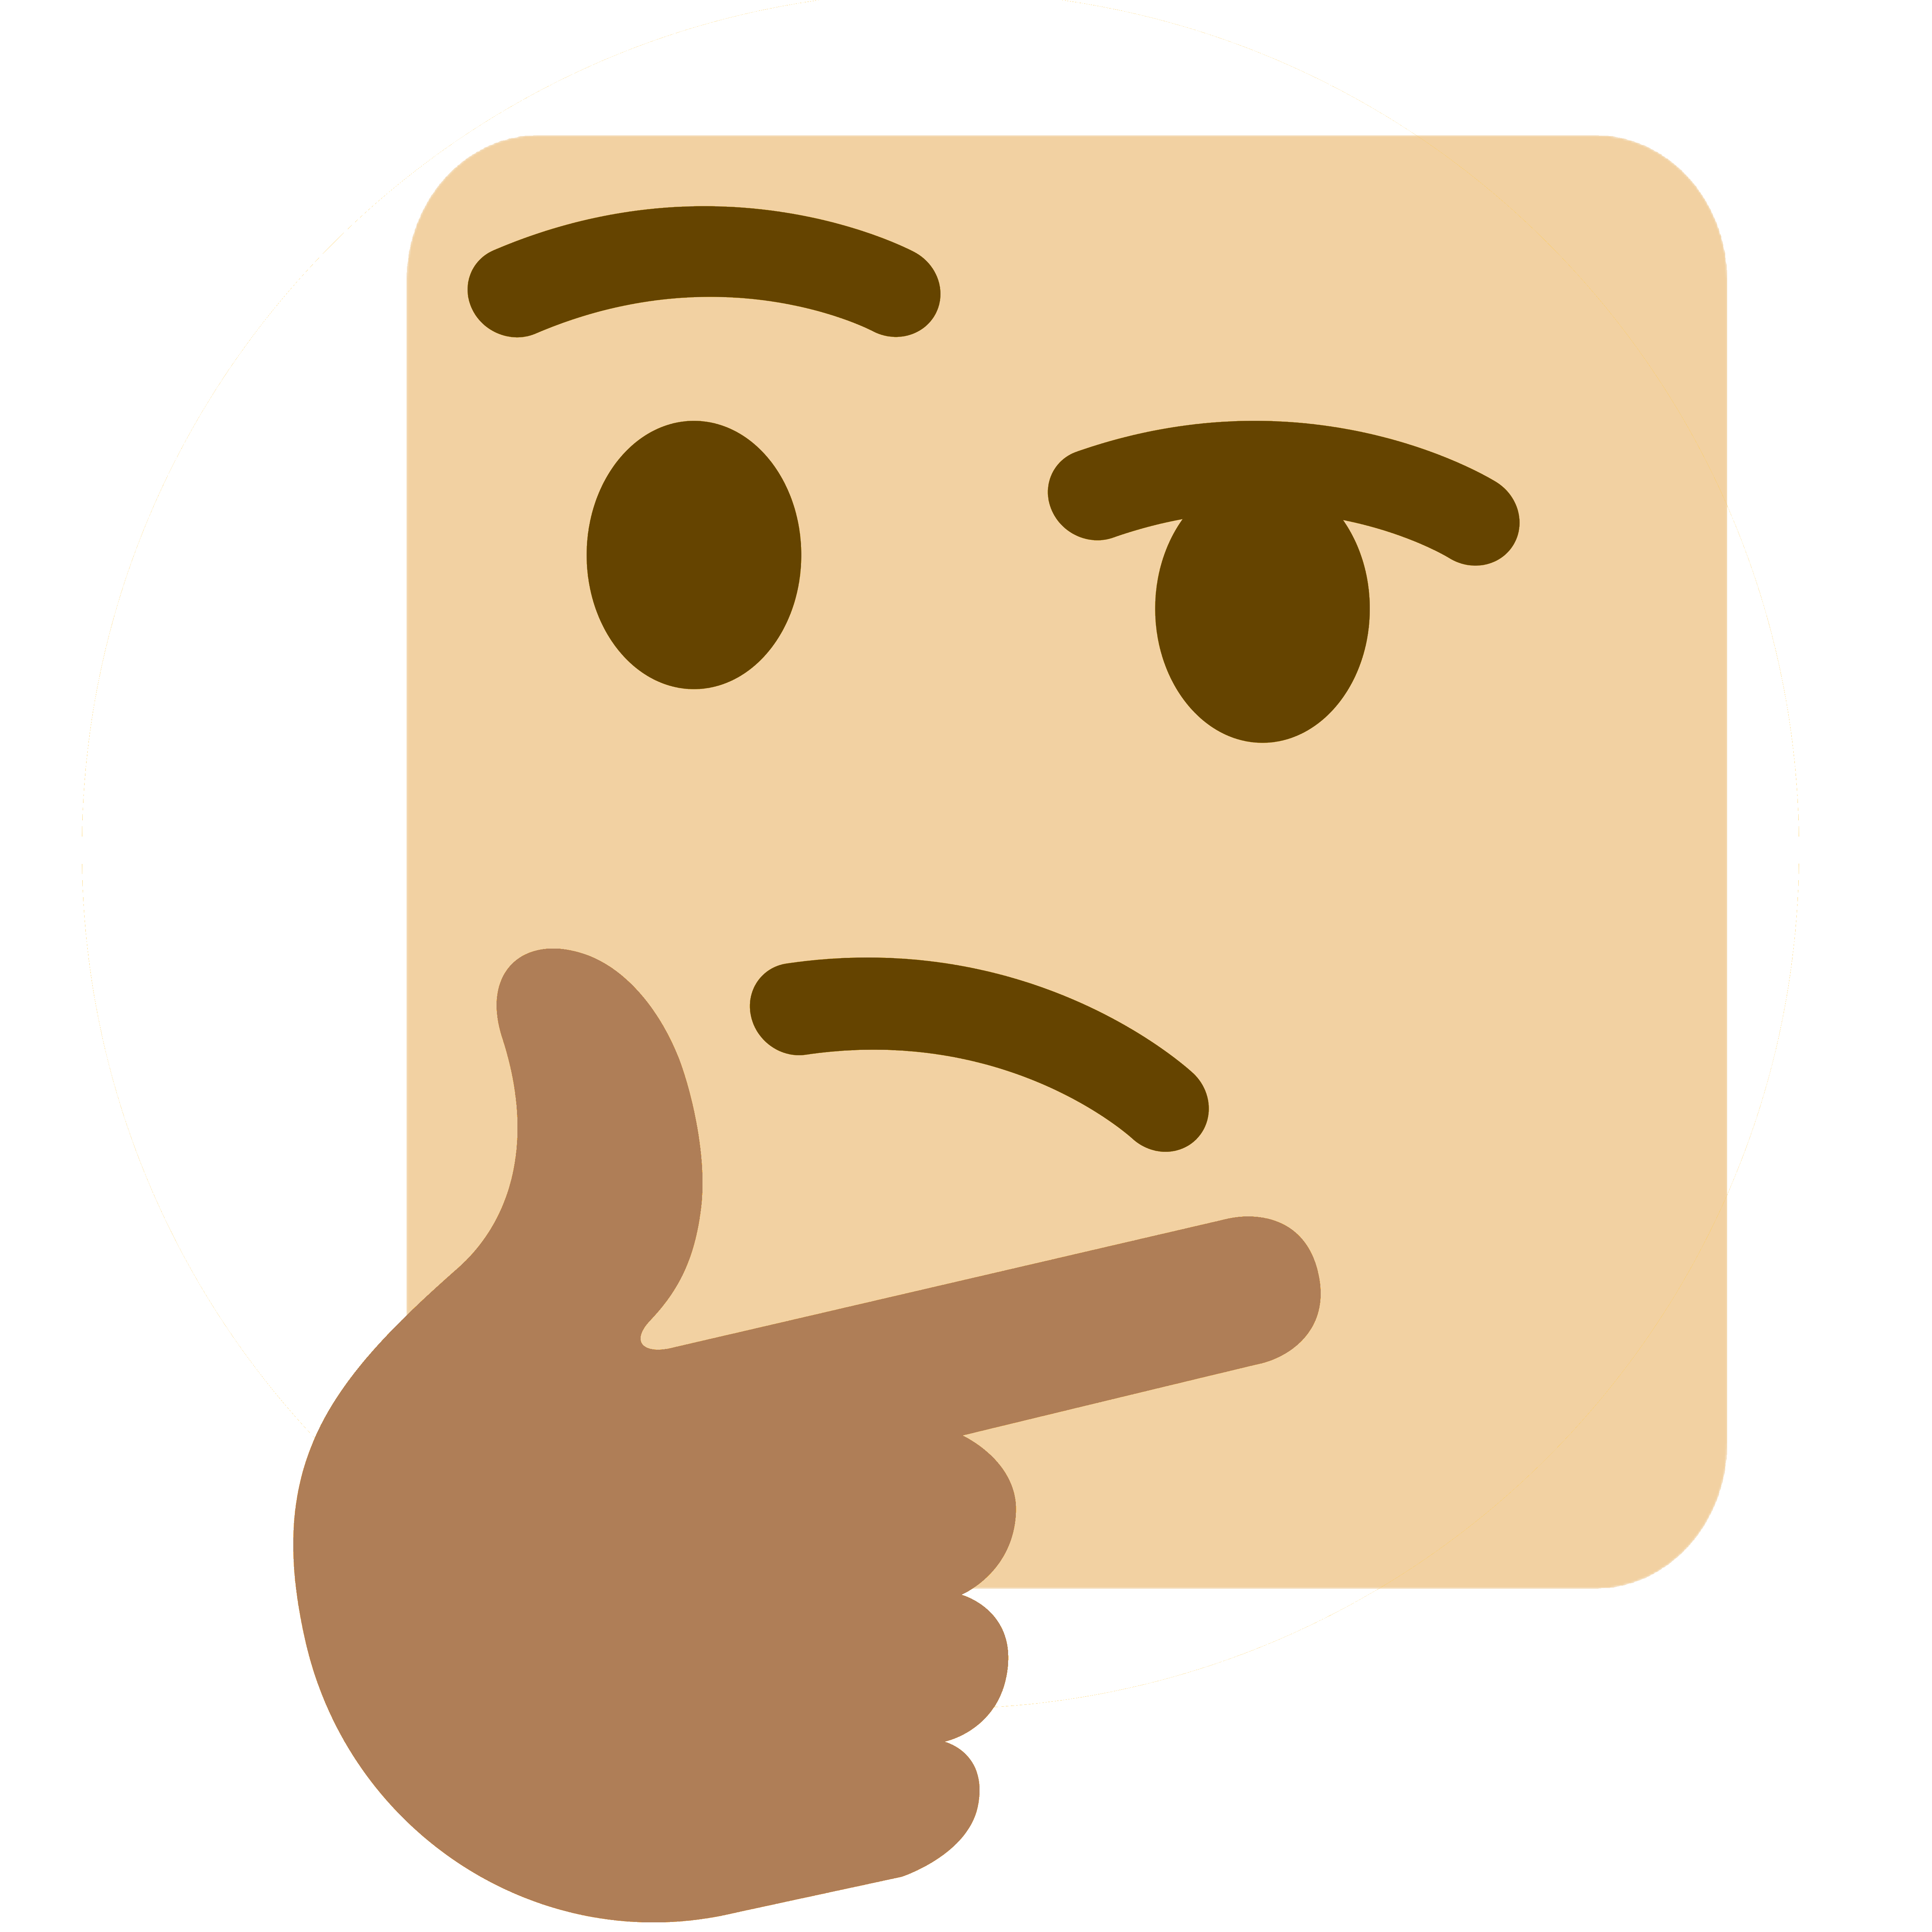 Skin clipart skin tone. Skintonethink discord emoji q